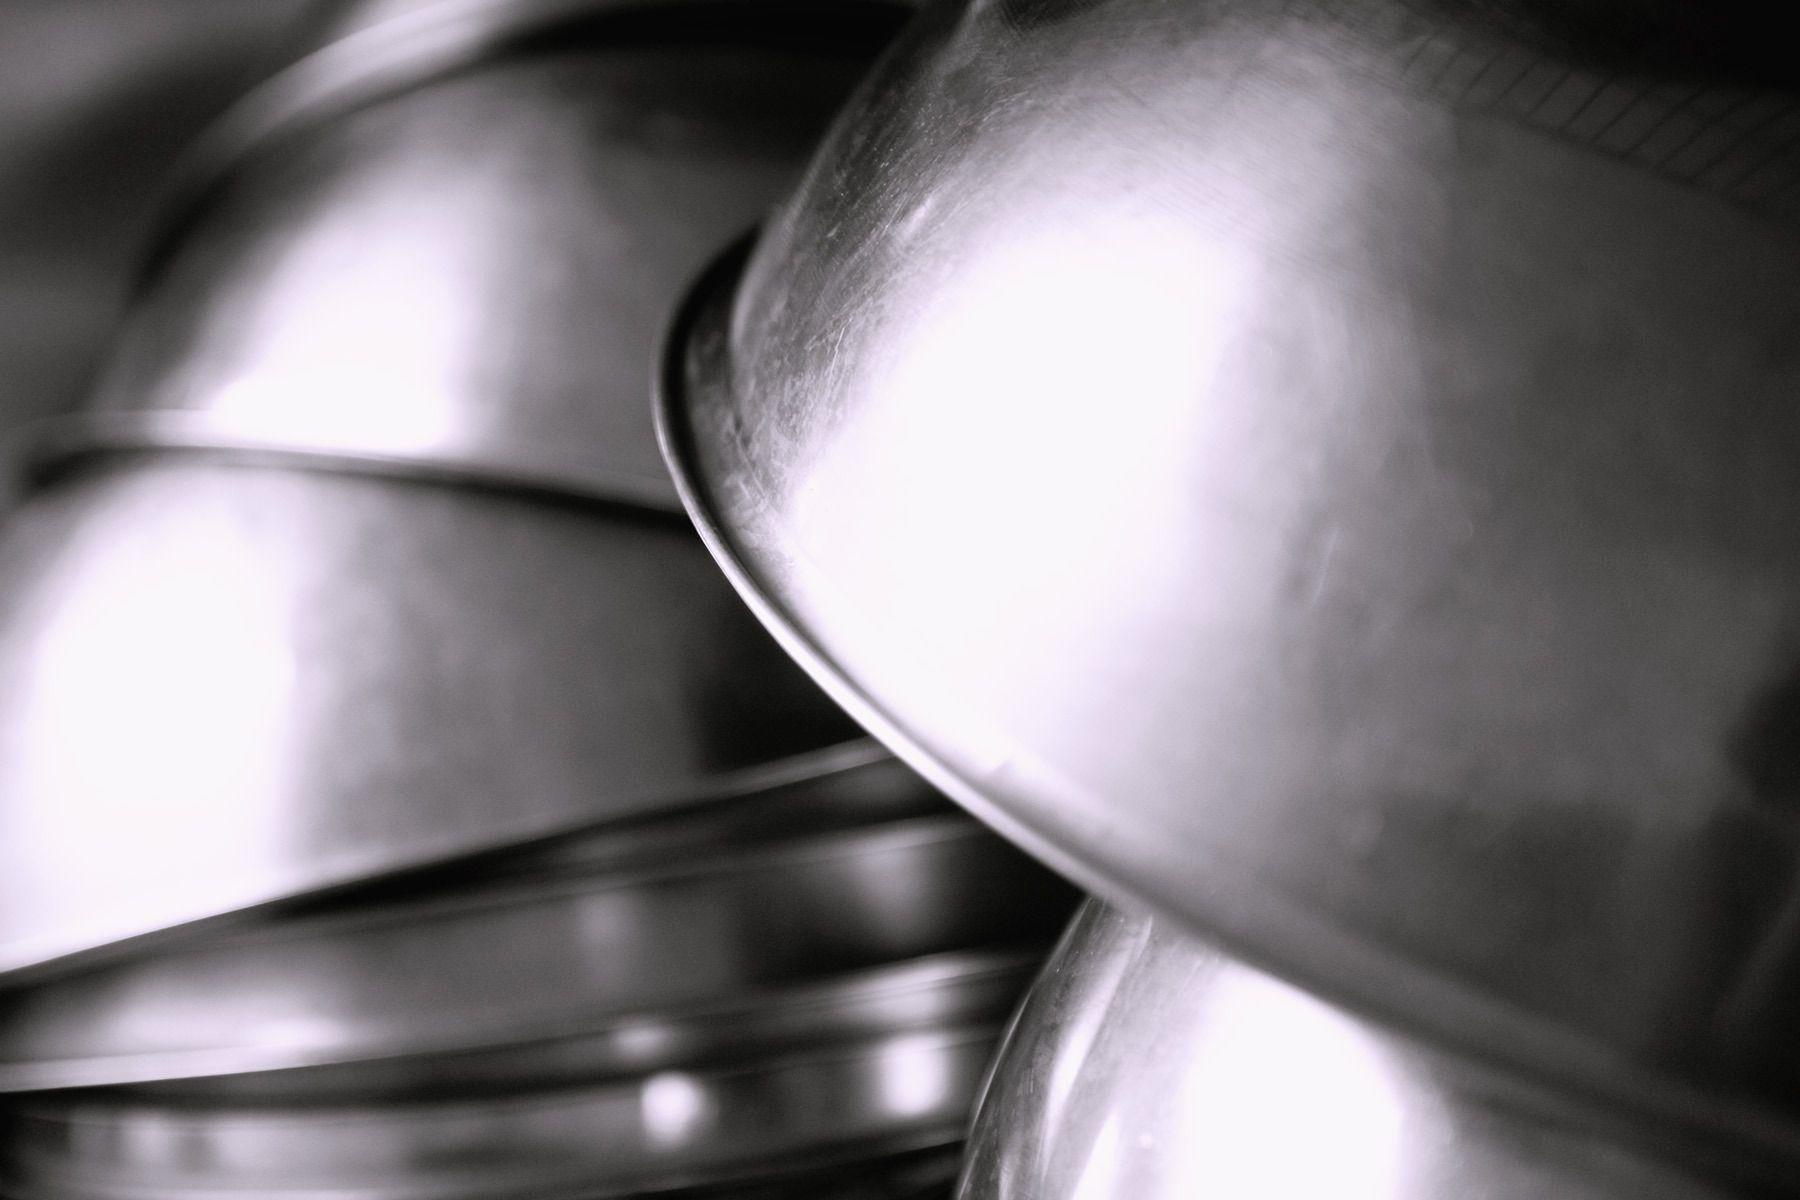 1kitchen_bowls_cook_mixing_mg_2786